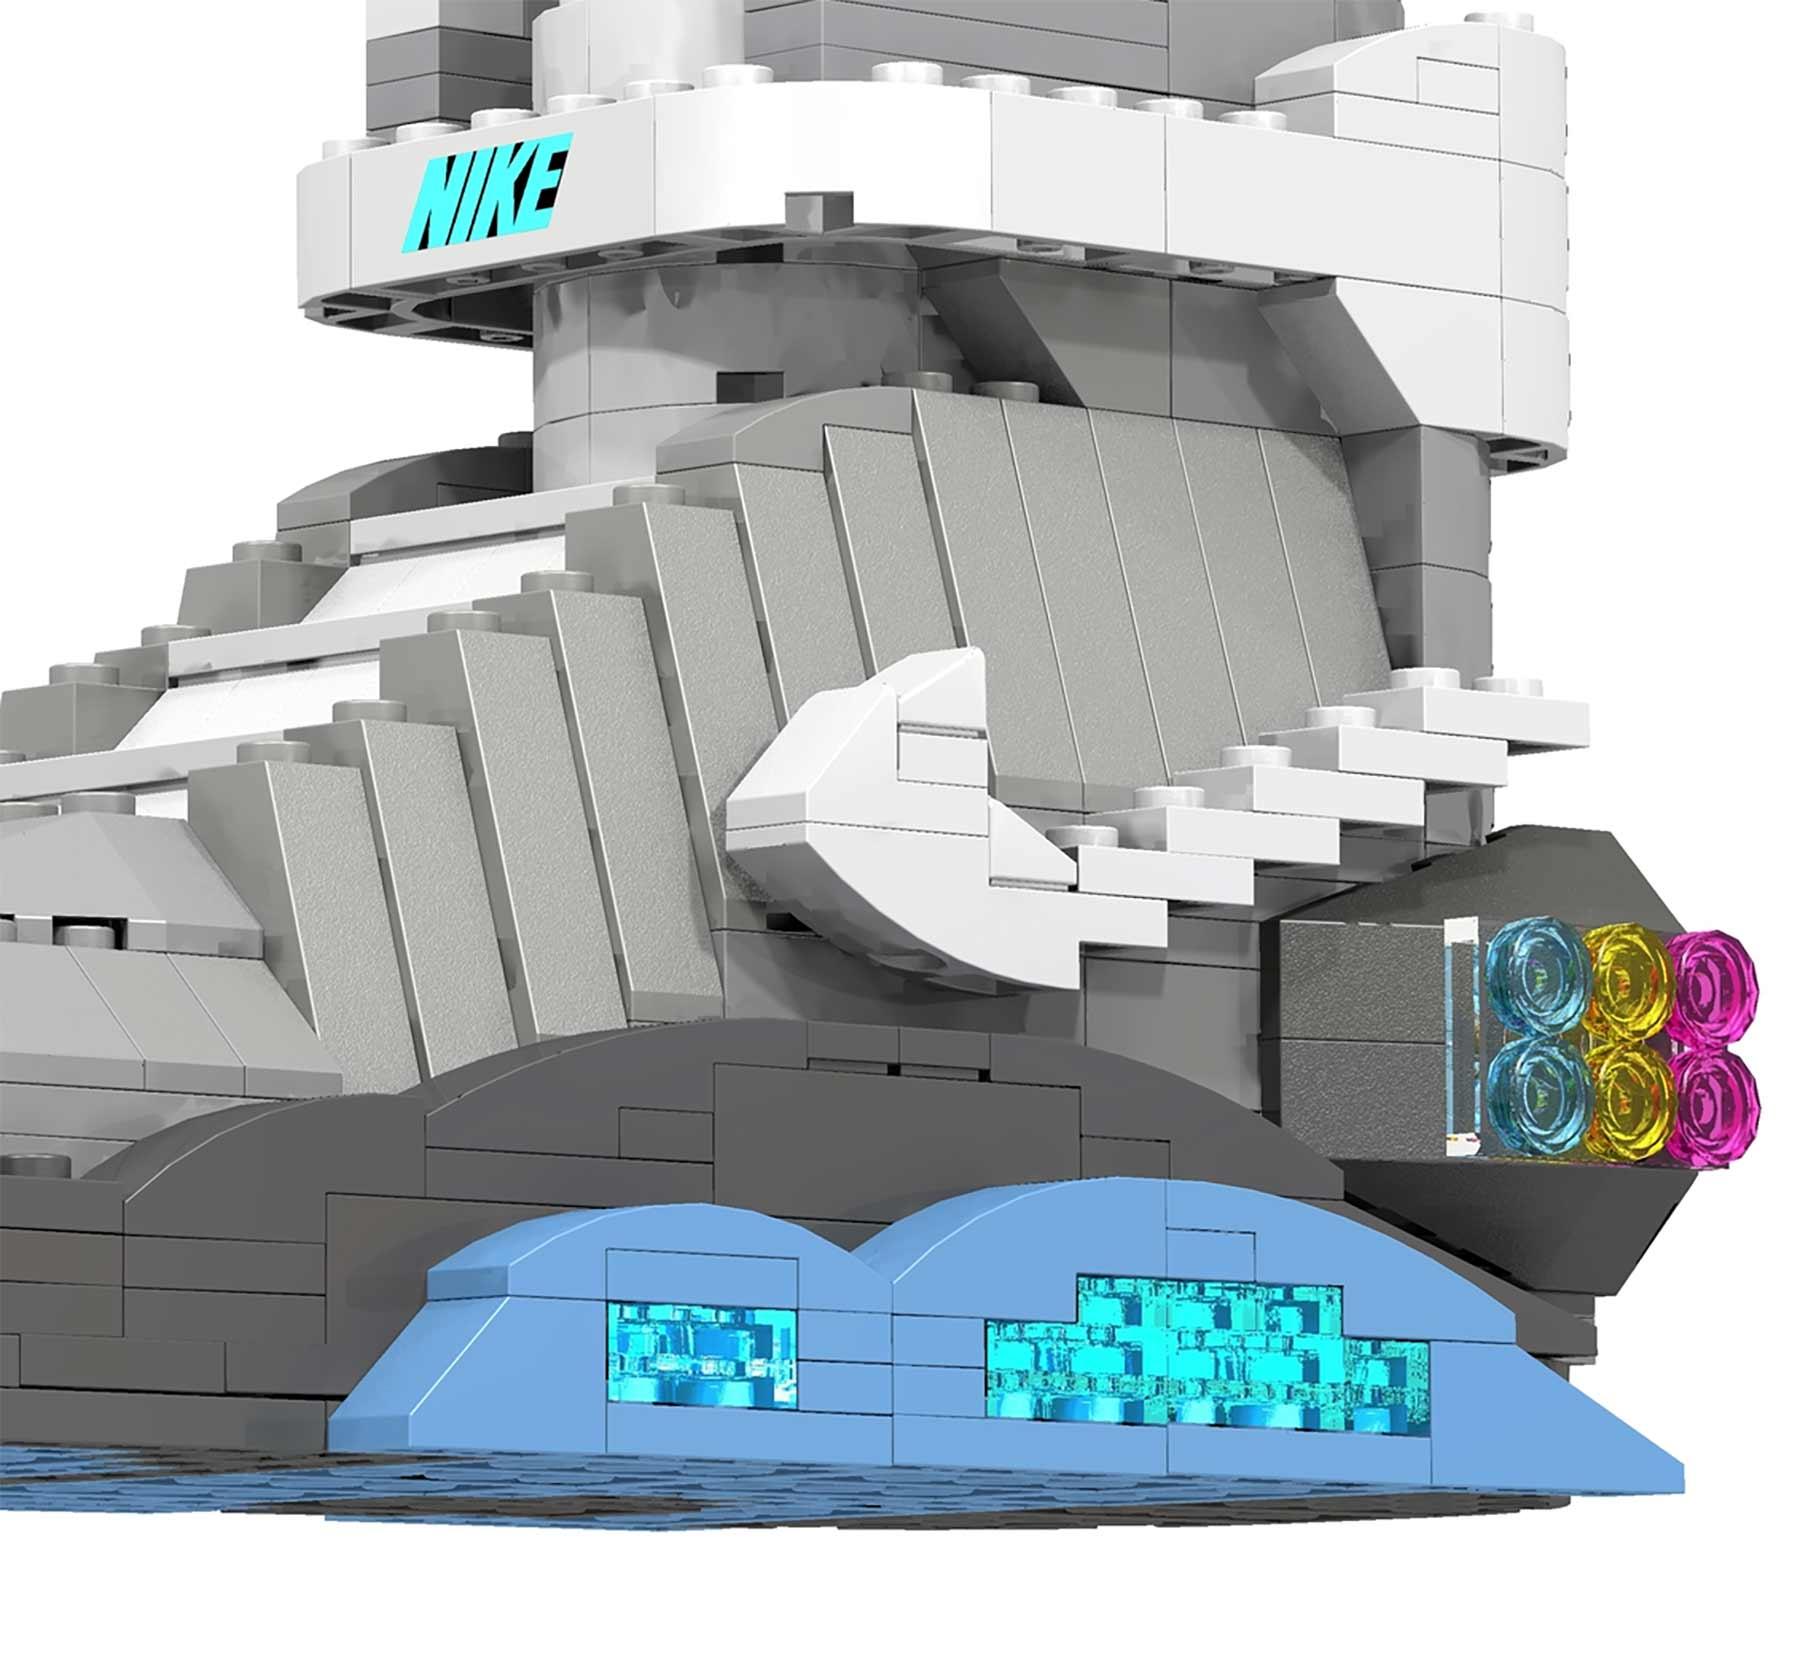 LEGO-Sneaker von Tom Yoo LEGO-Sneaker-Tom-Yoo_04